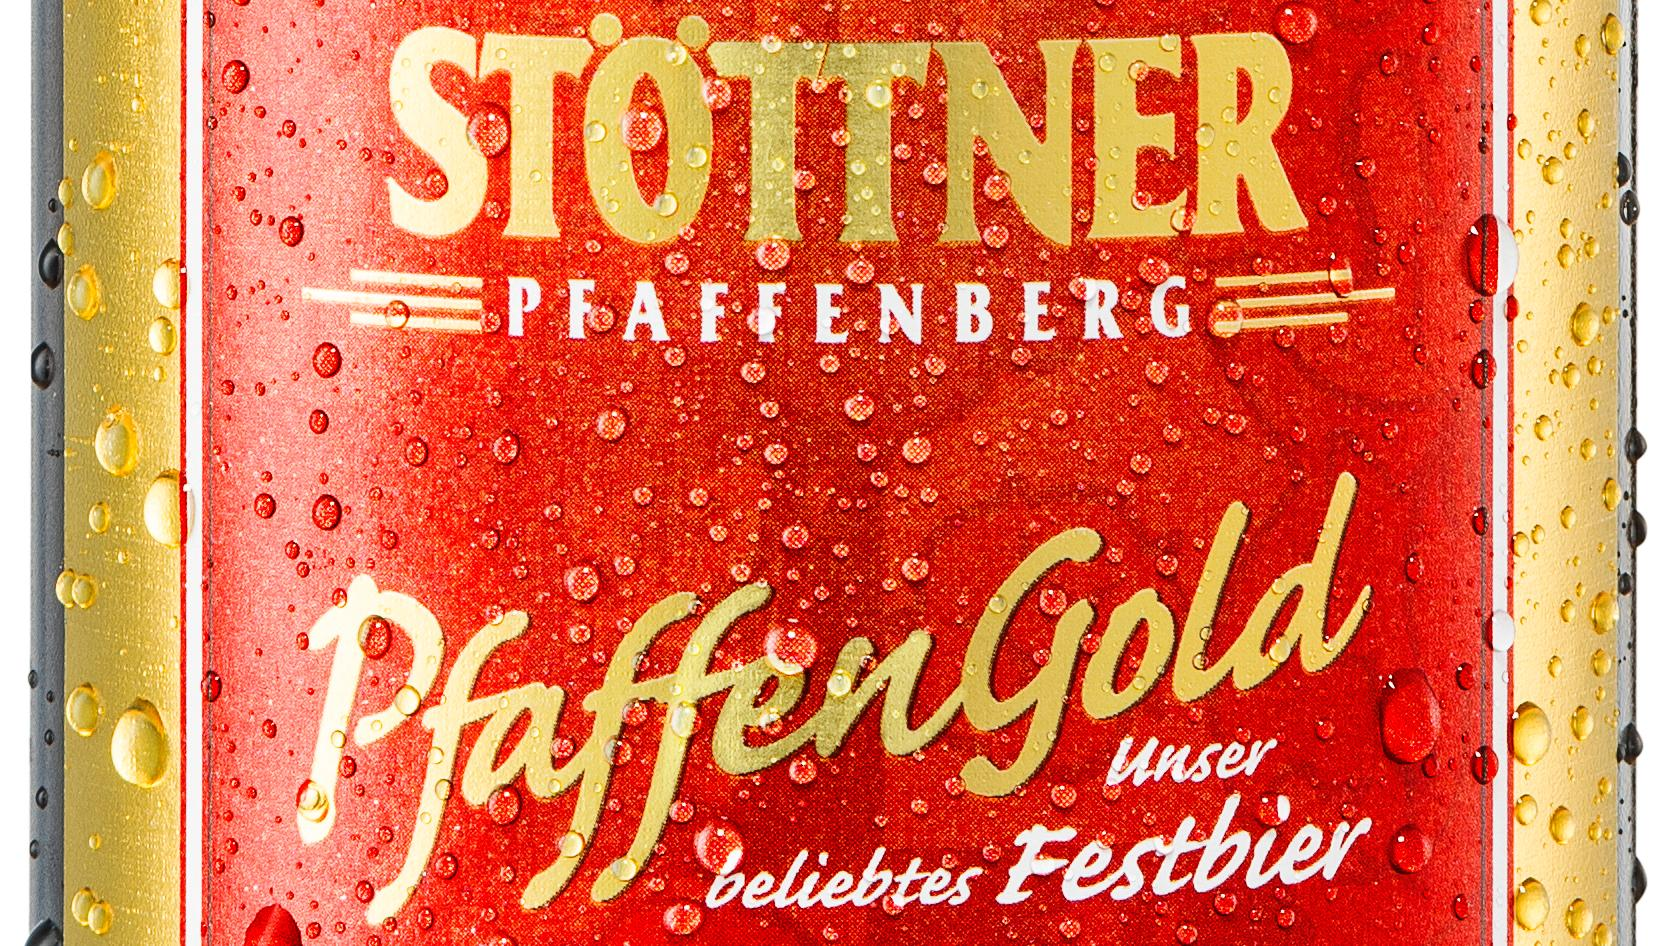 Pfaffengold - Festbier